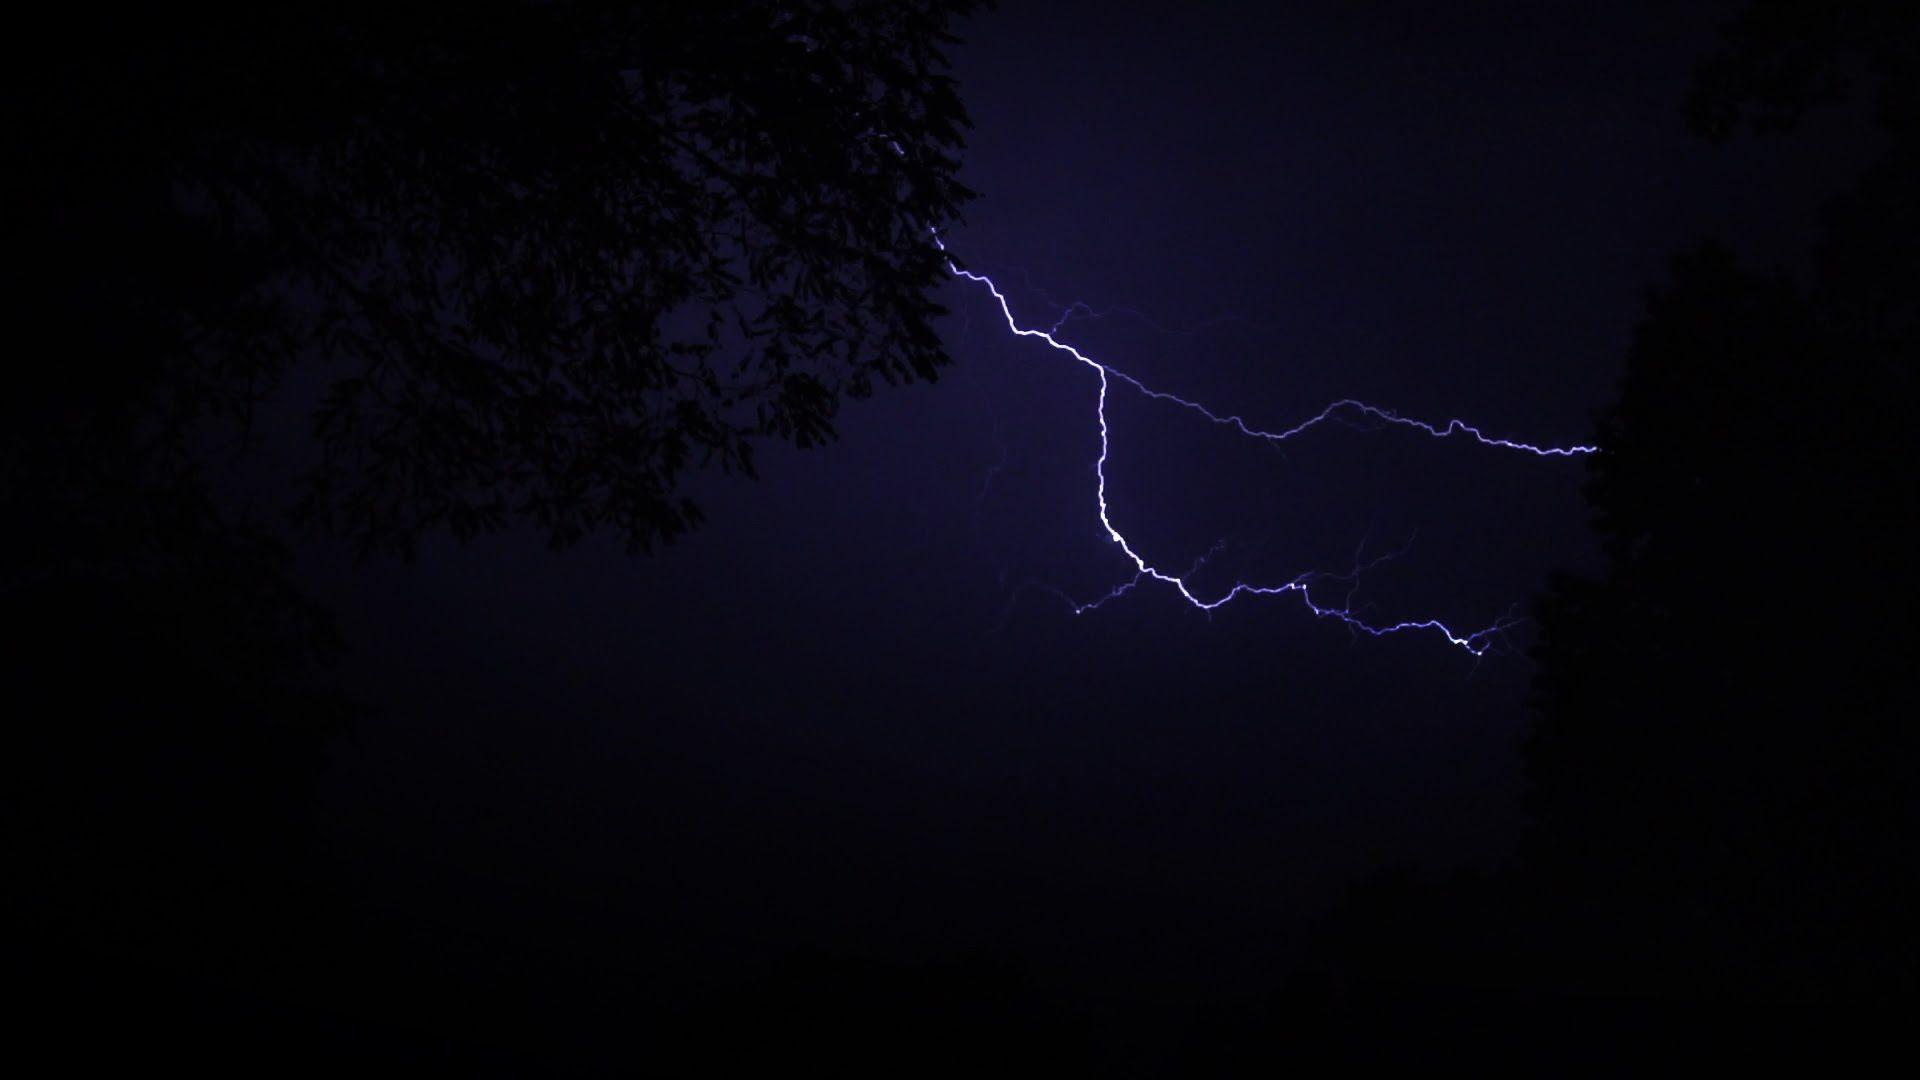 Lightning Bolt Picture